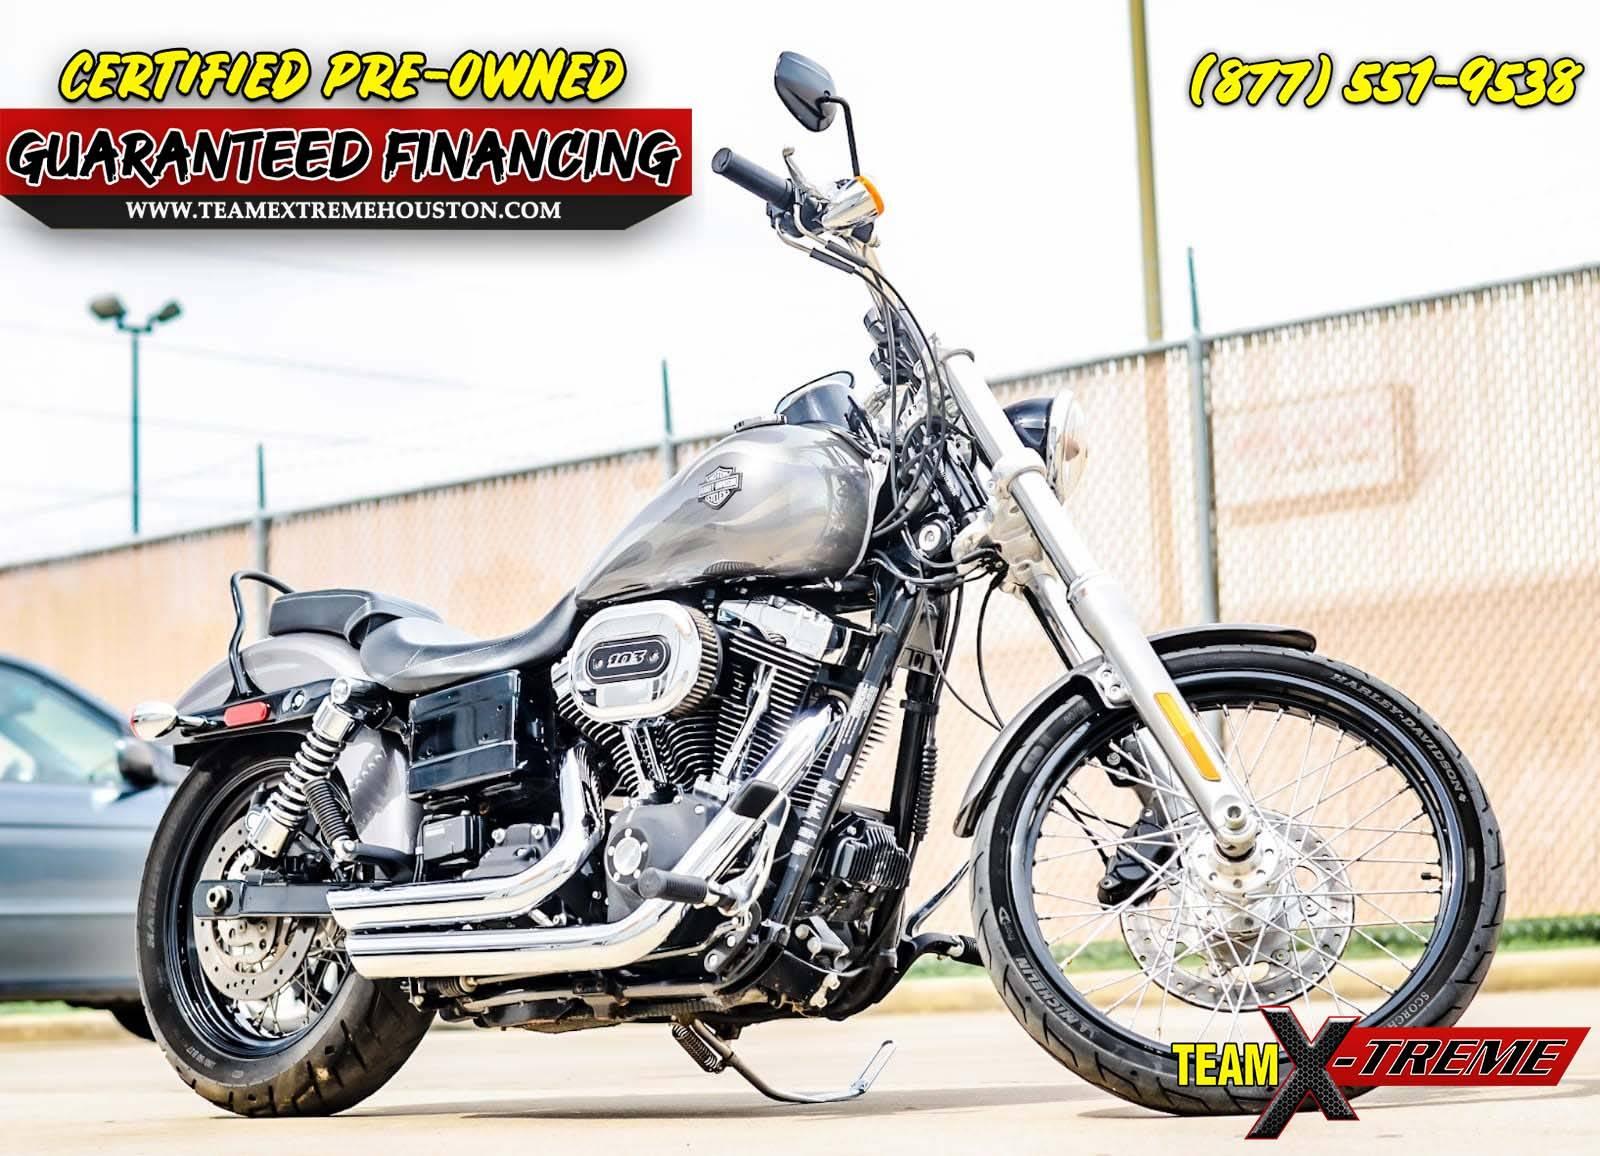 Raw Steel Engine Motor Frame Crash Bar Mount Bracket Harley Knucklehead Panhead